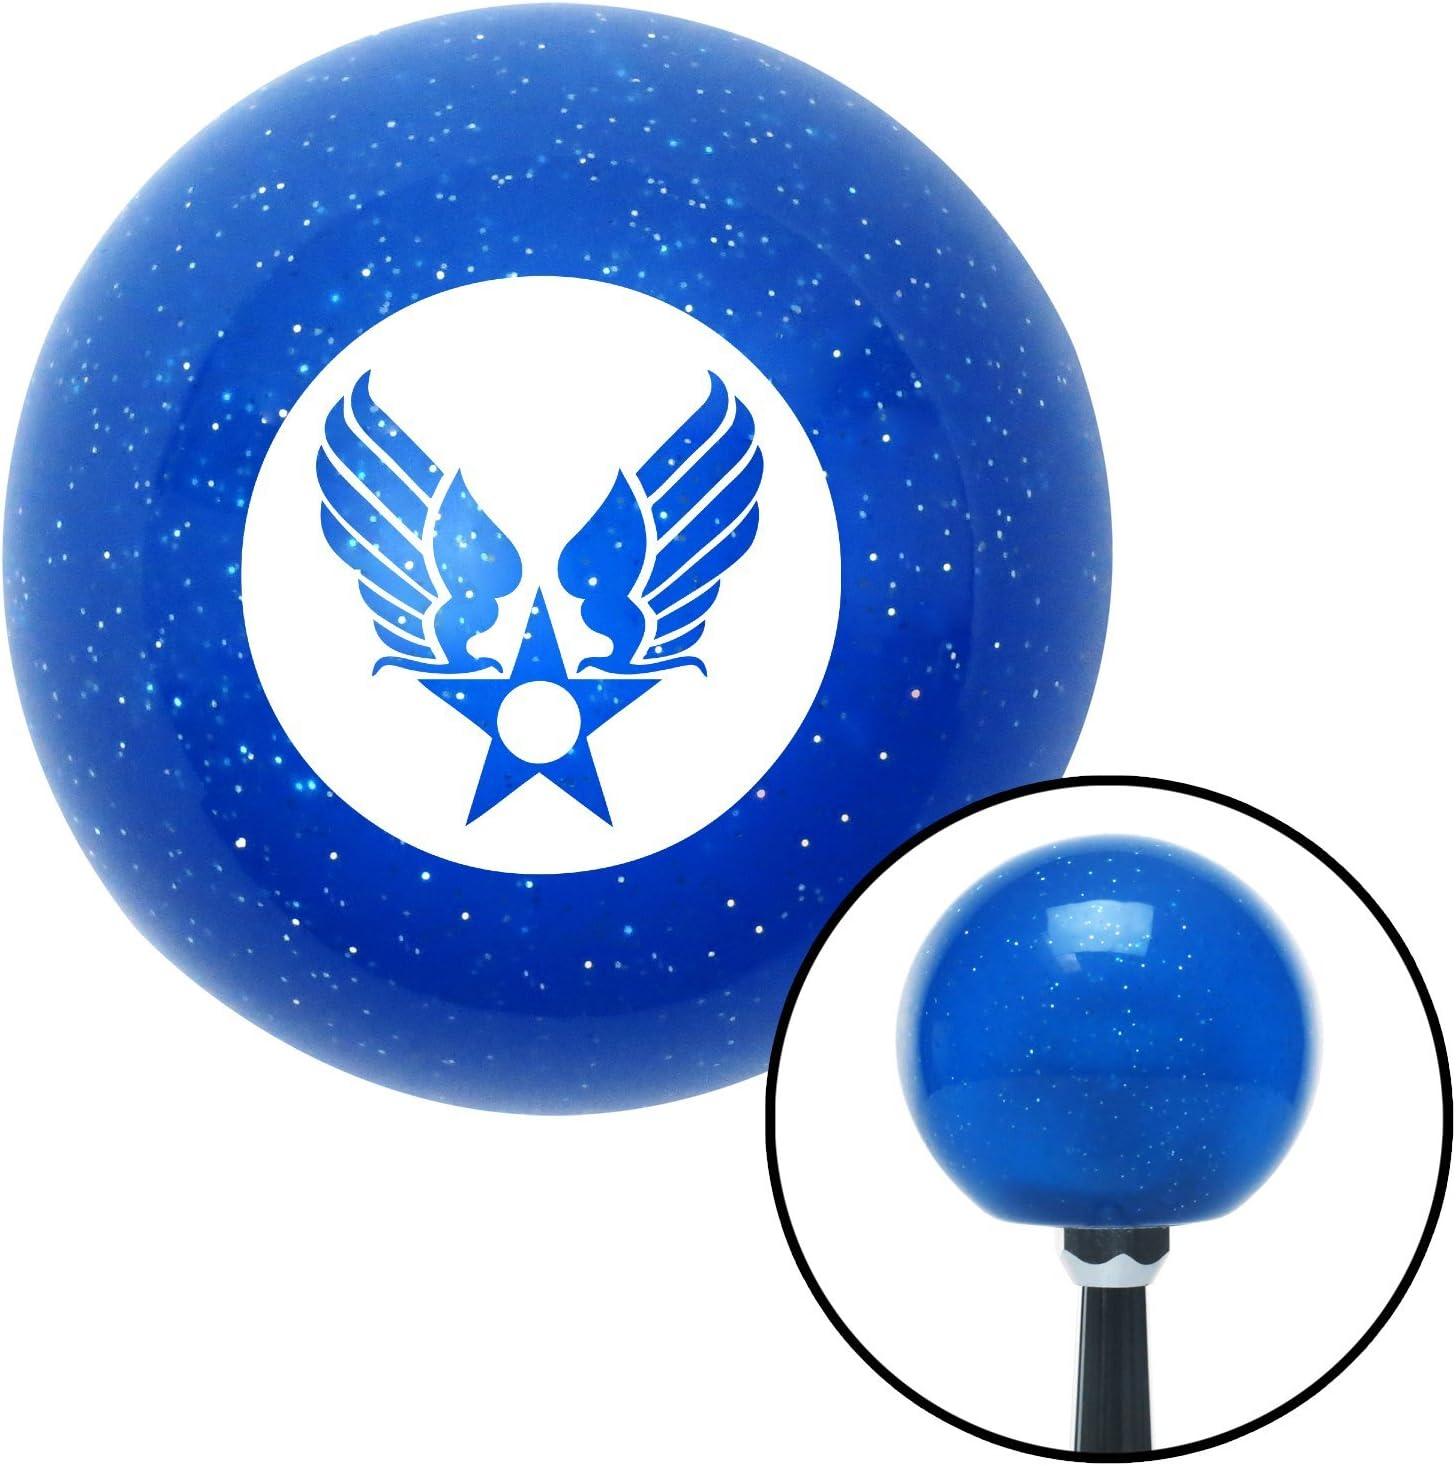 White Army Air Corps American Shifter 24570 Blue Metal Flake Shift Knob